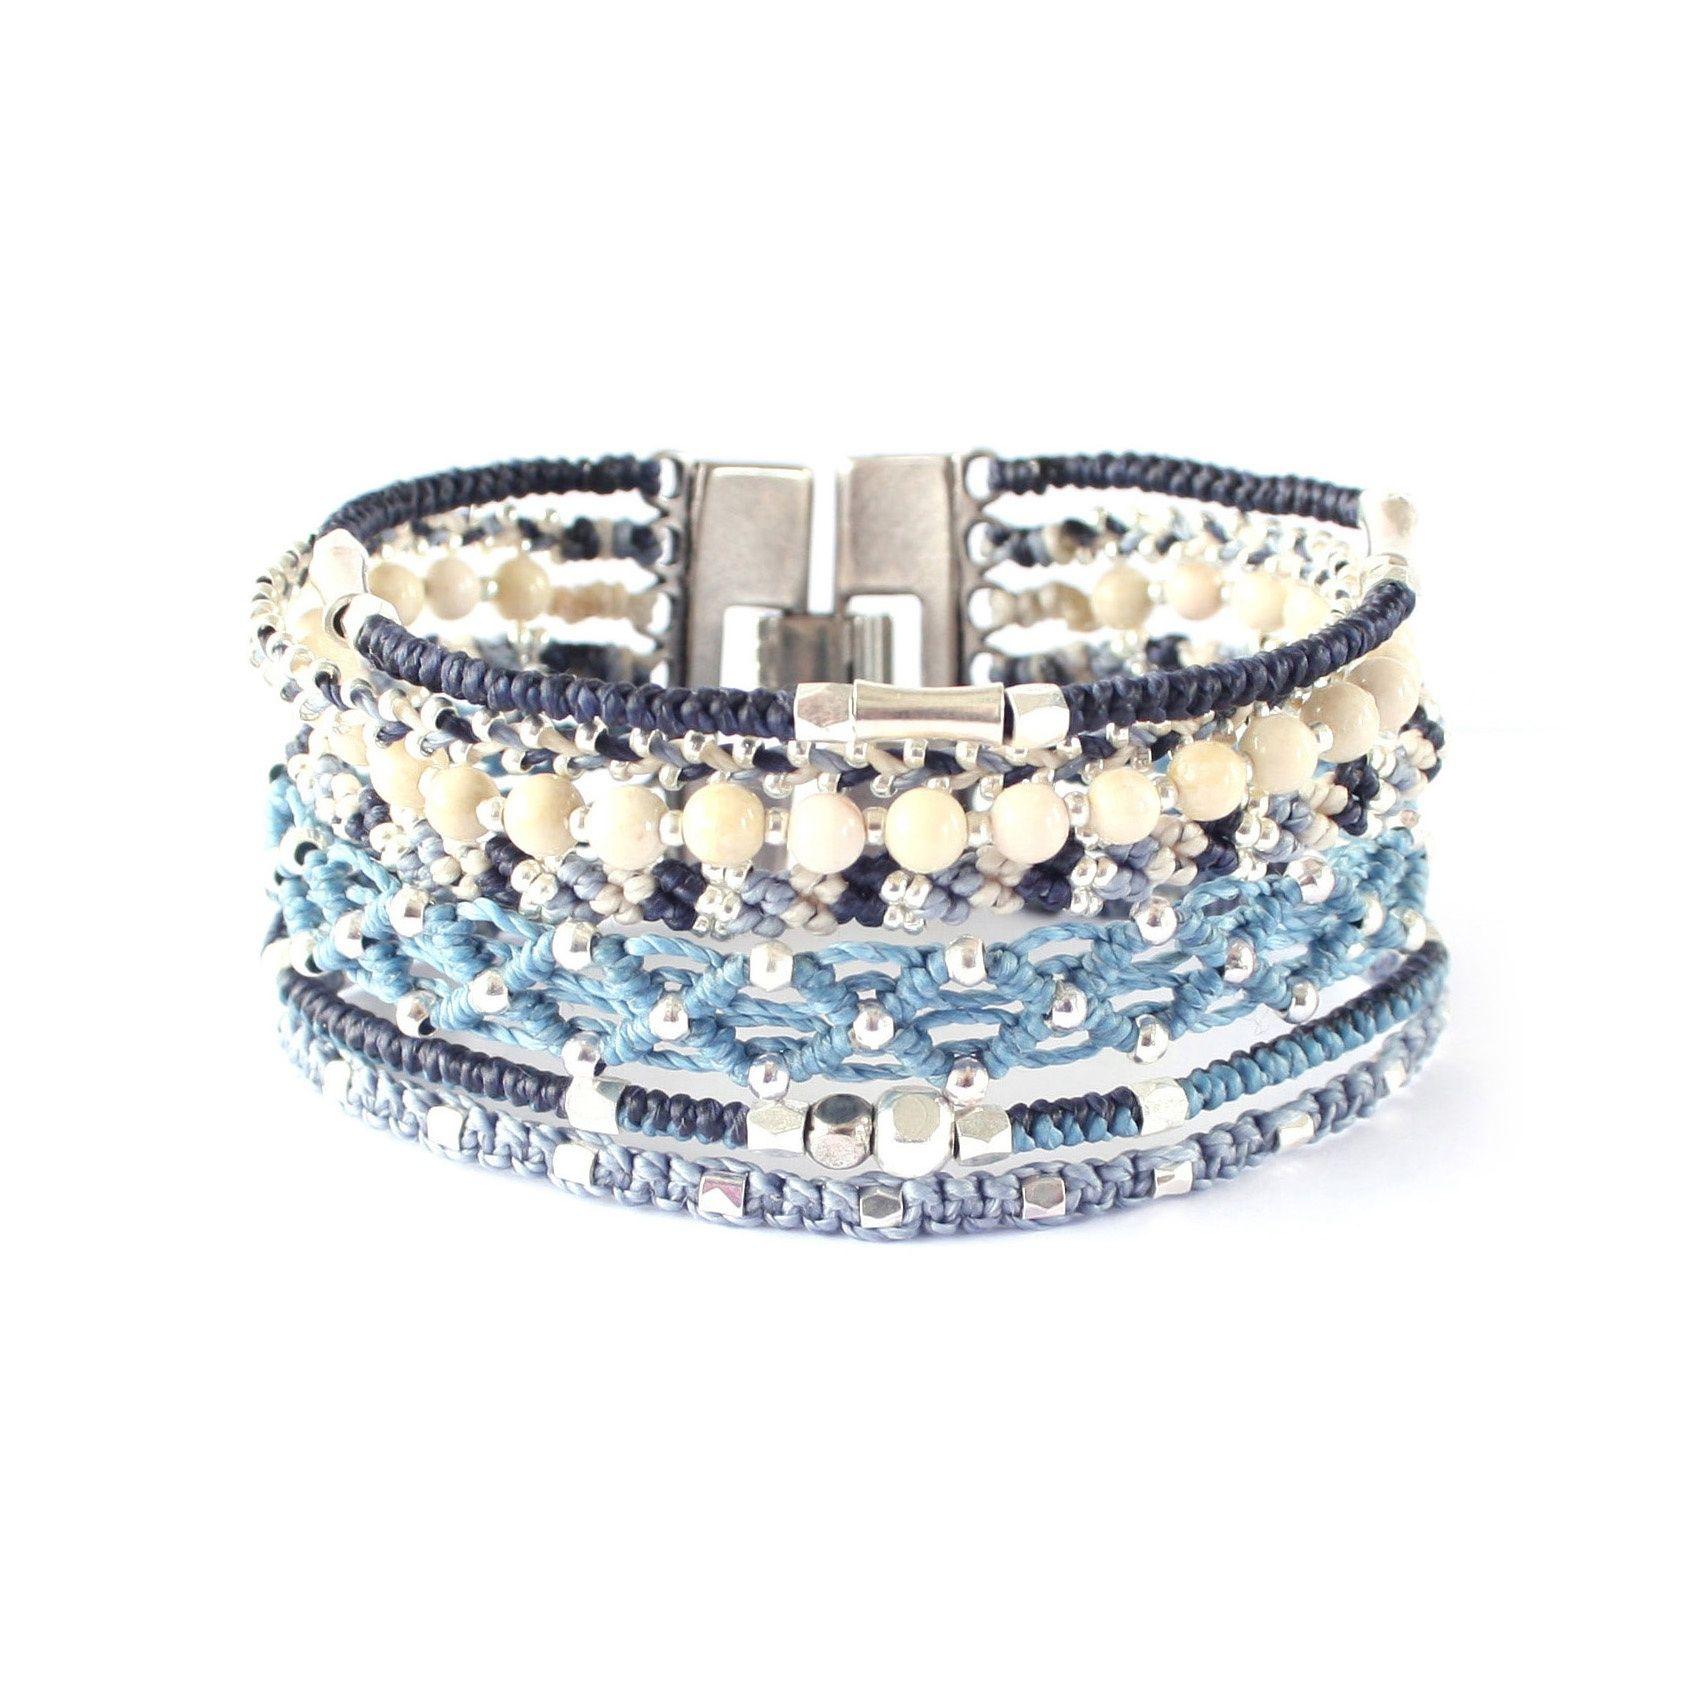 Wakami All One Cuff - armband - blått/silver - fairtrade - Masomenos